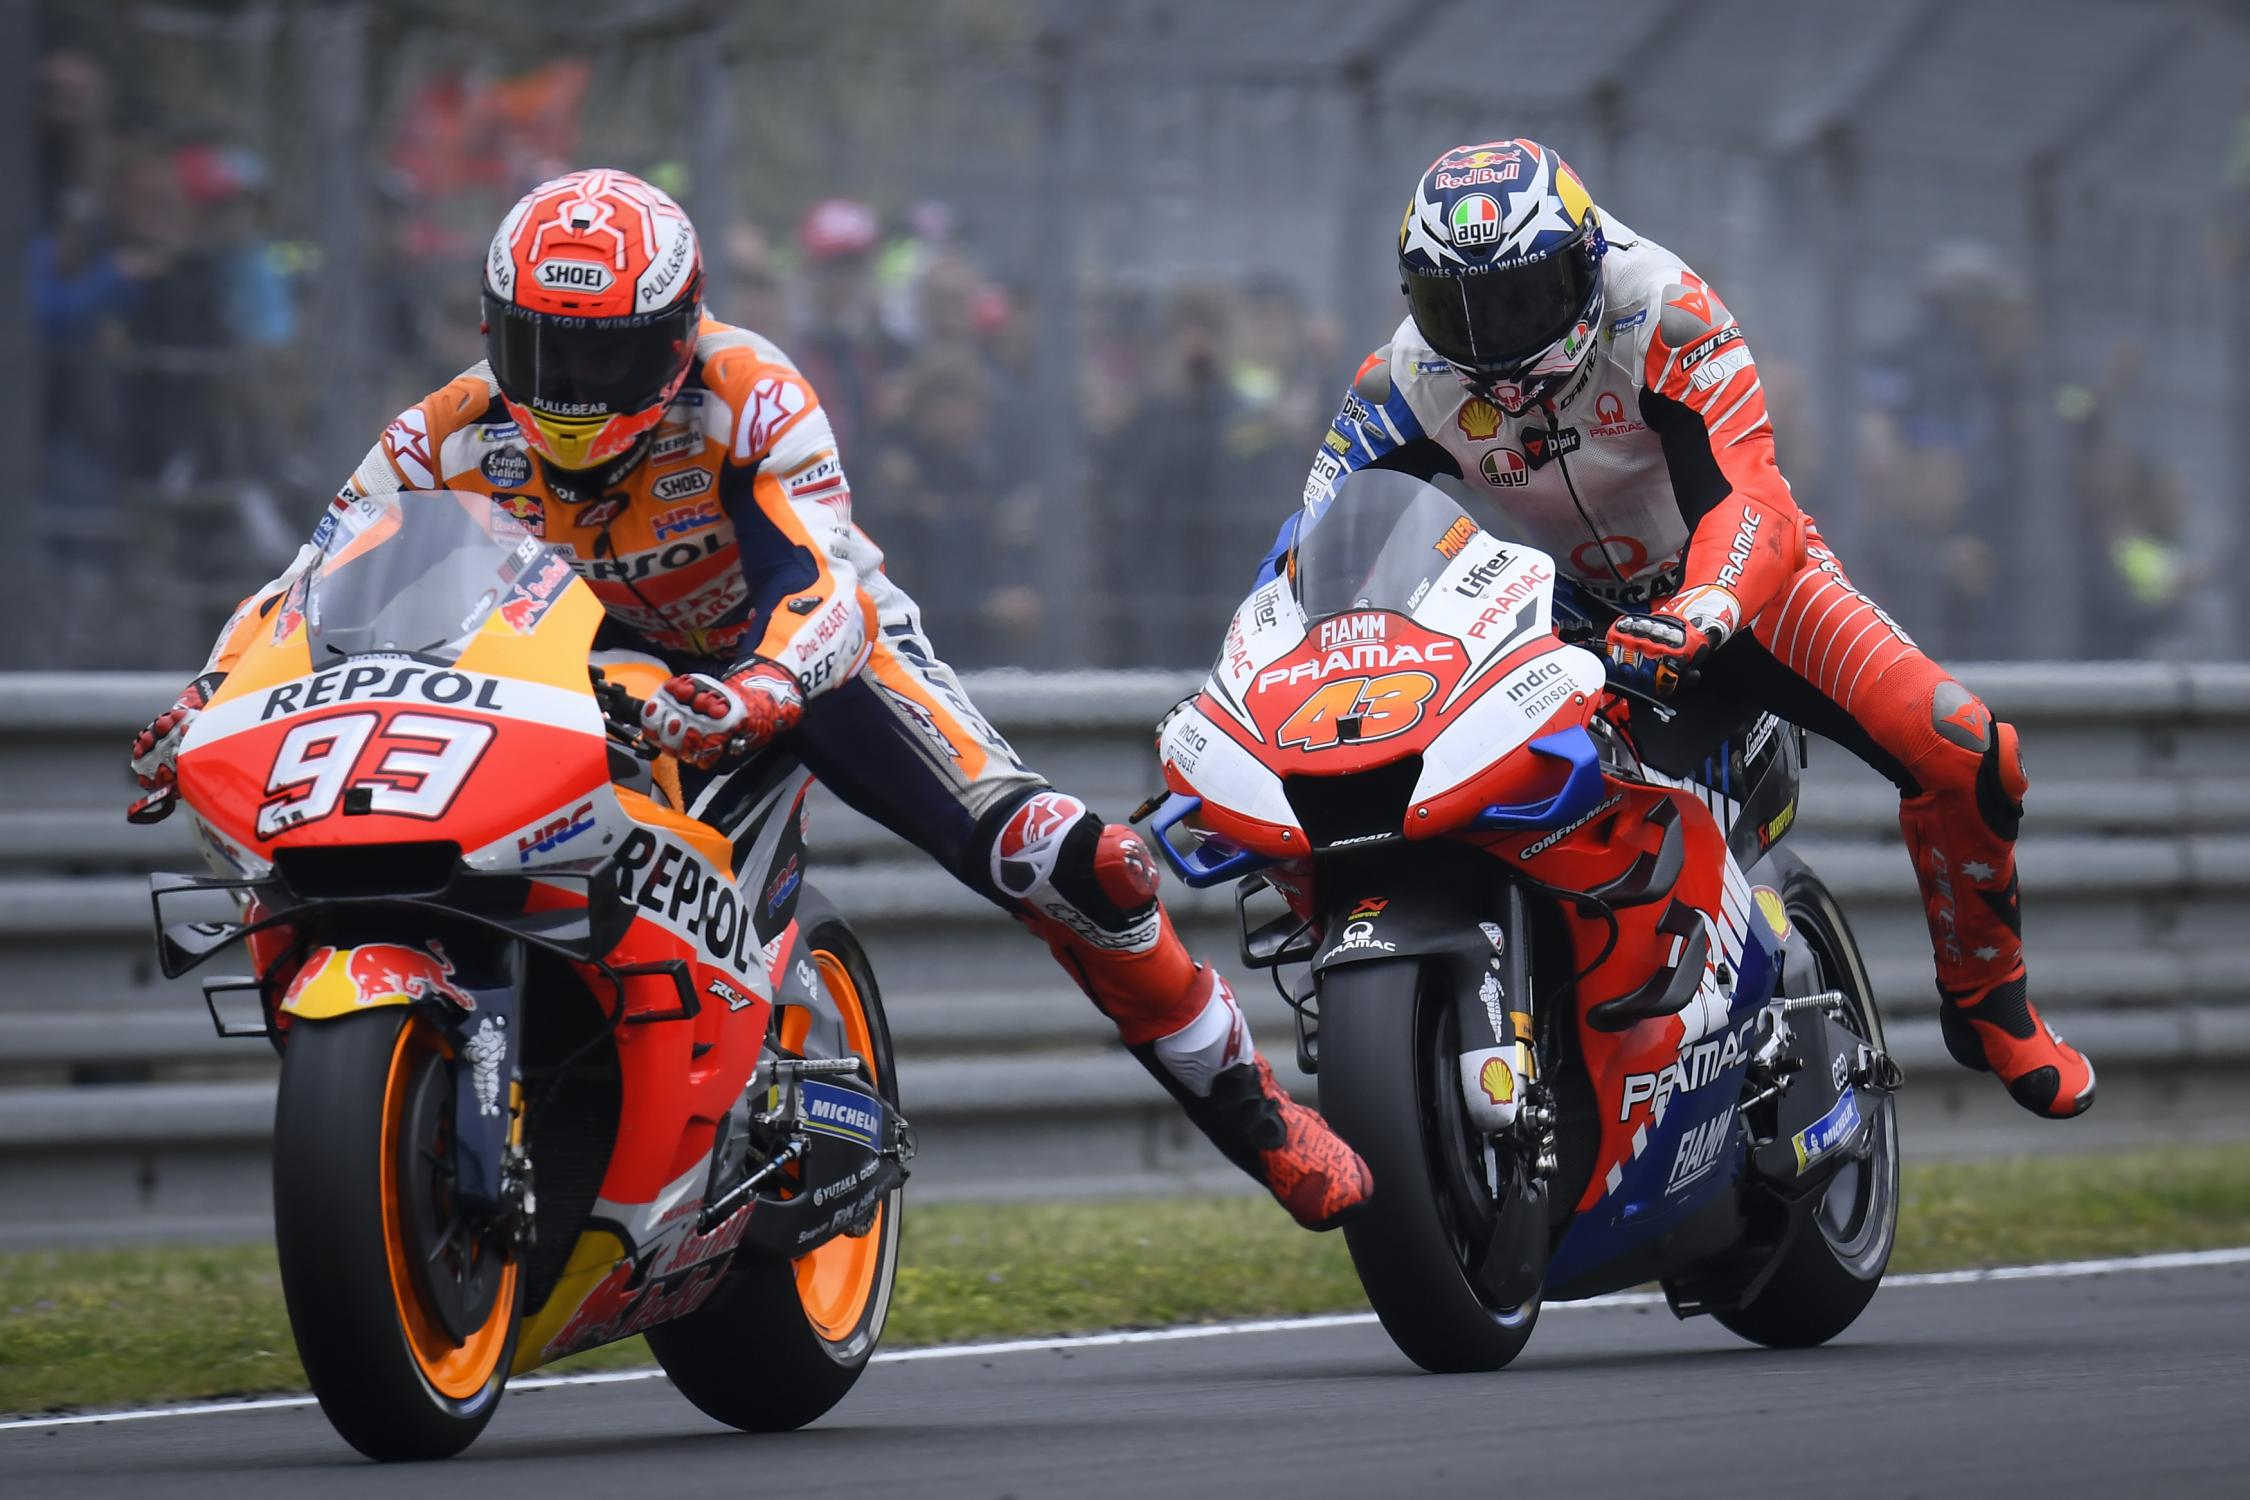 MotoGP 2019: Гра При Ле-Мана фото